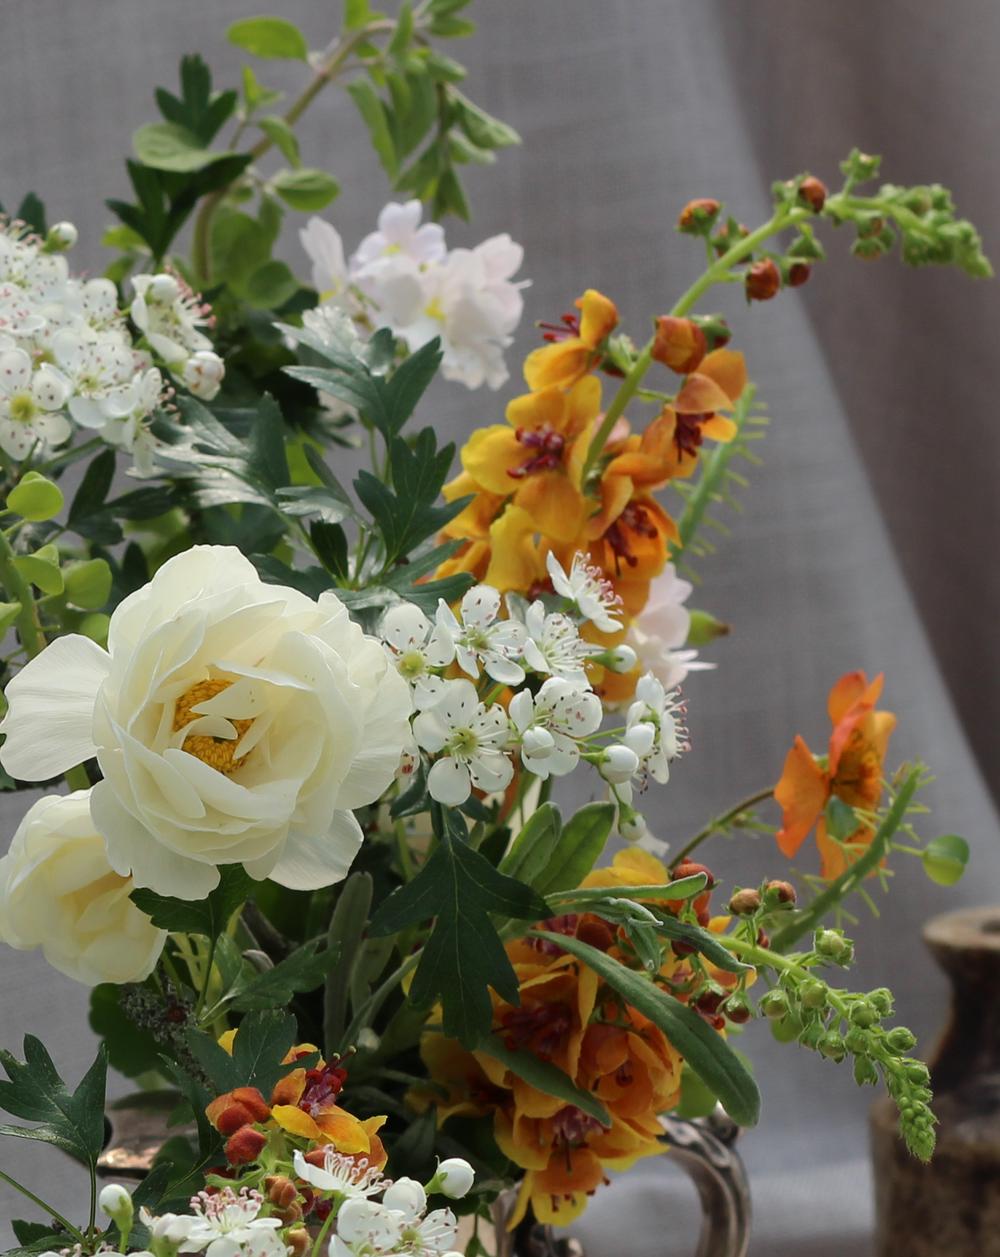 Early-summer-arrangement.png